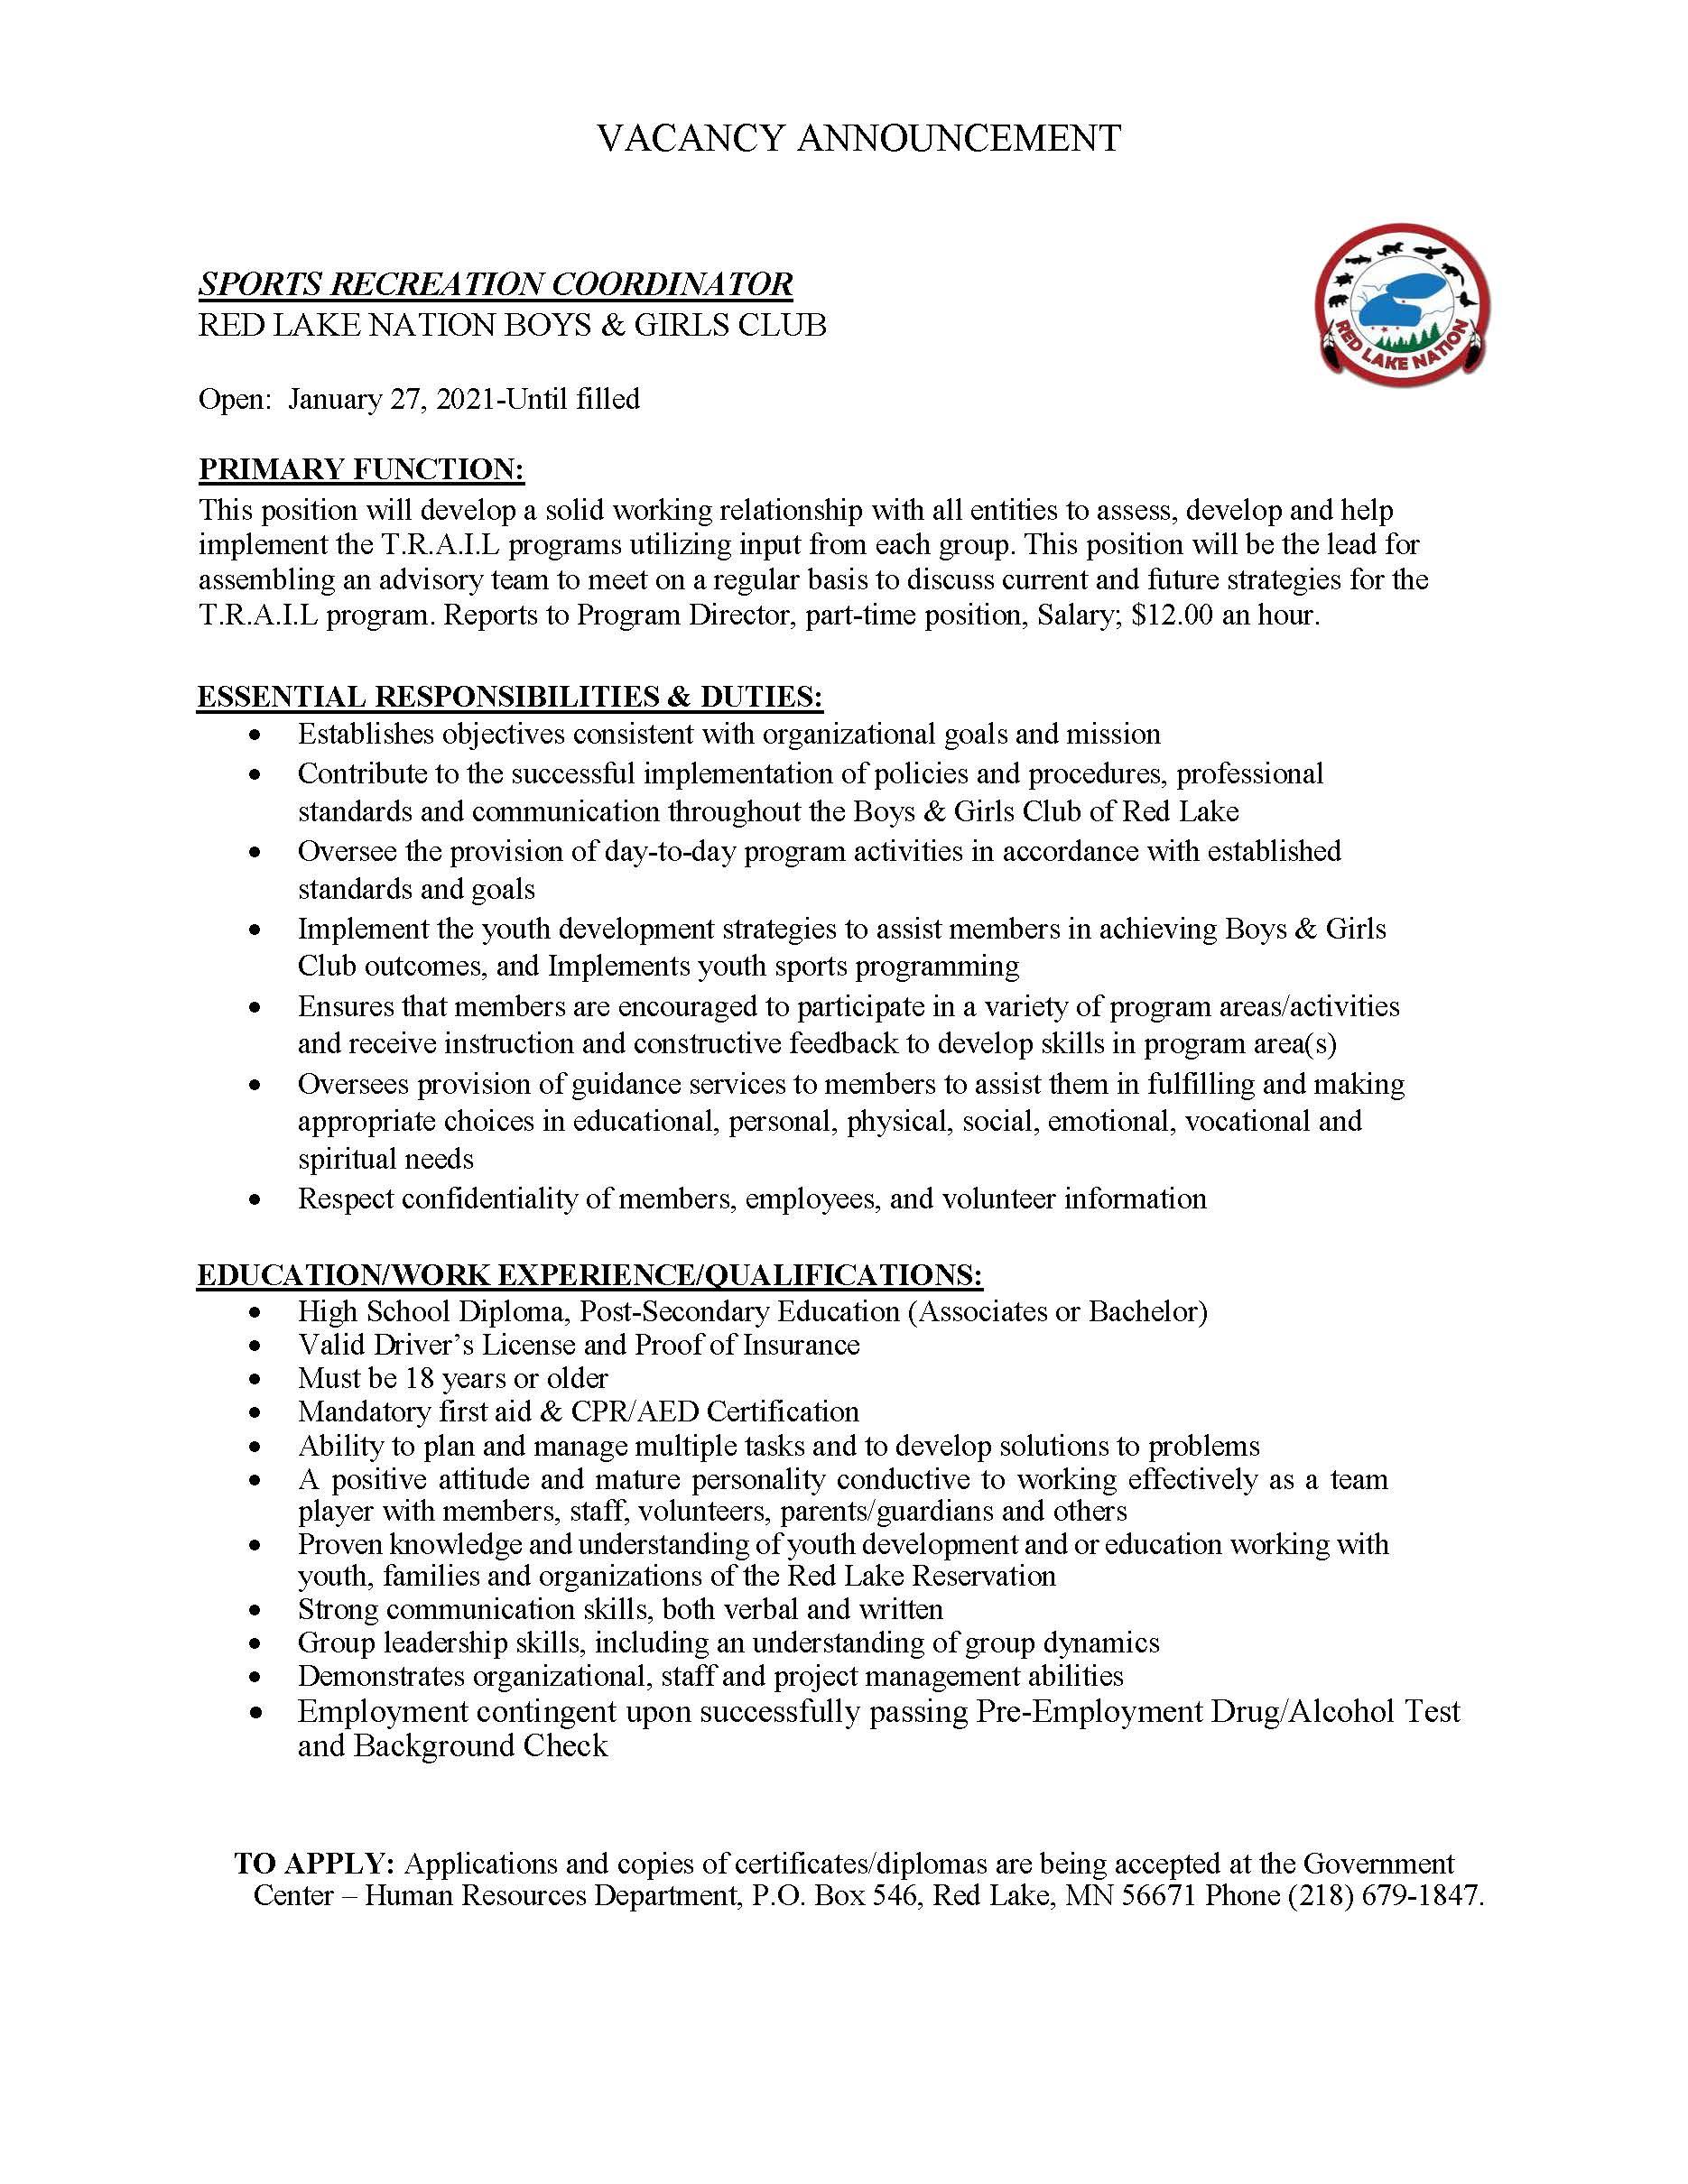 Sports Recreation Coordinator-Boys Girls Club-Job Announcement-1-27-2021